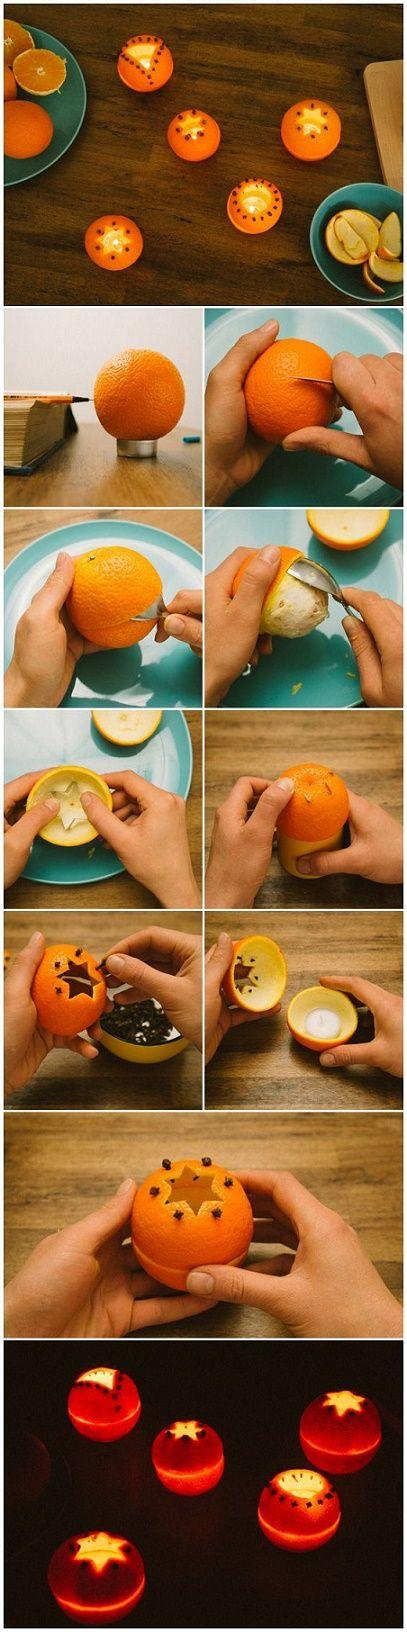 Velas con piel de naranja